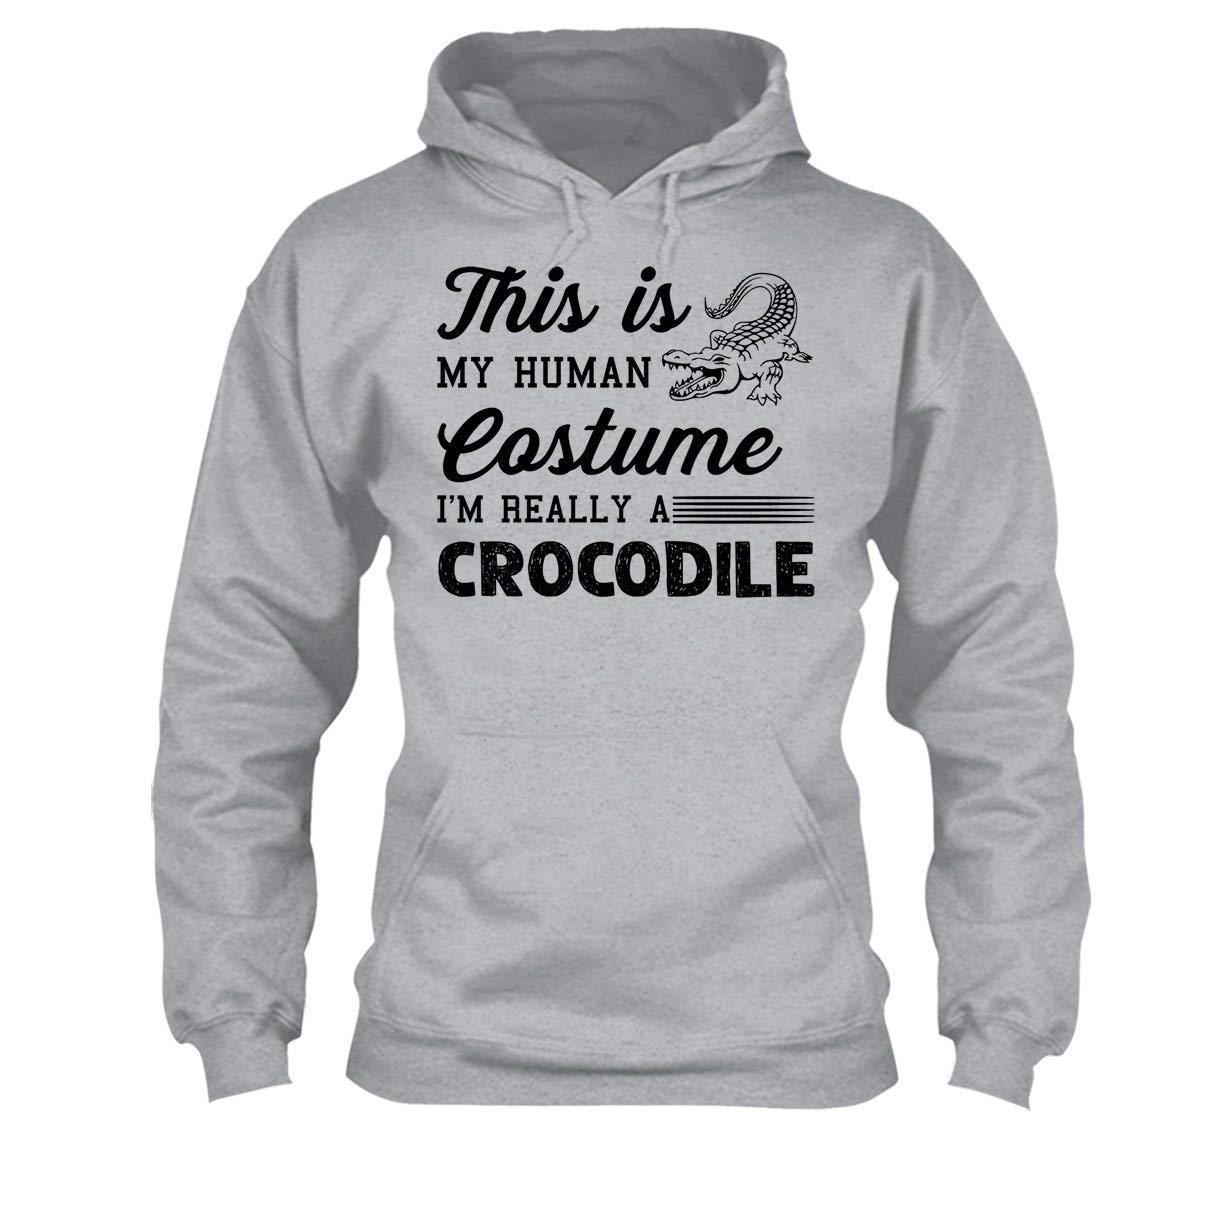 Im Really A Crocodile Tee Shirt Cool Sweatshirt Hoodie